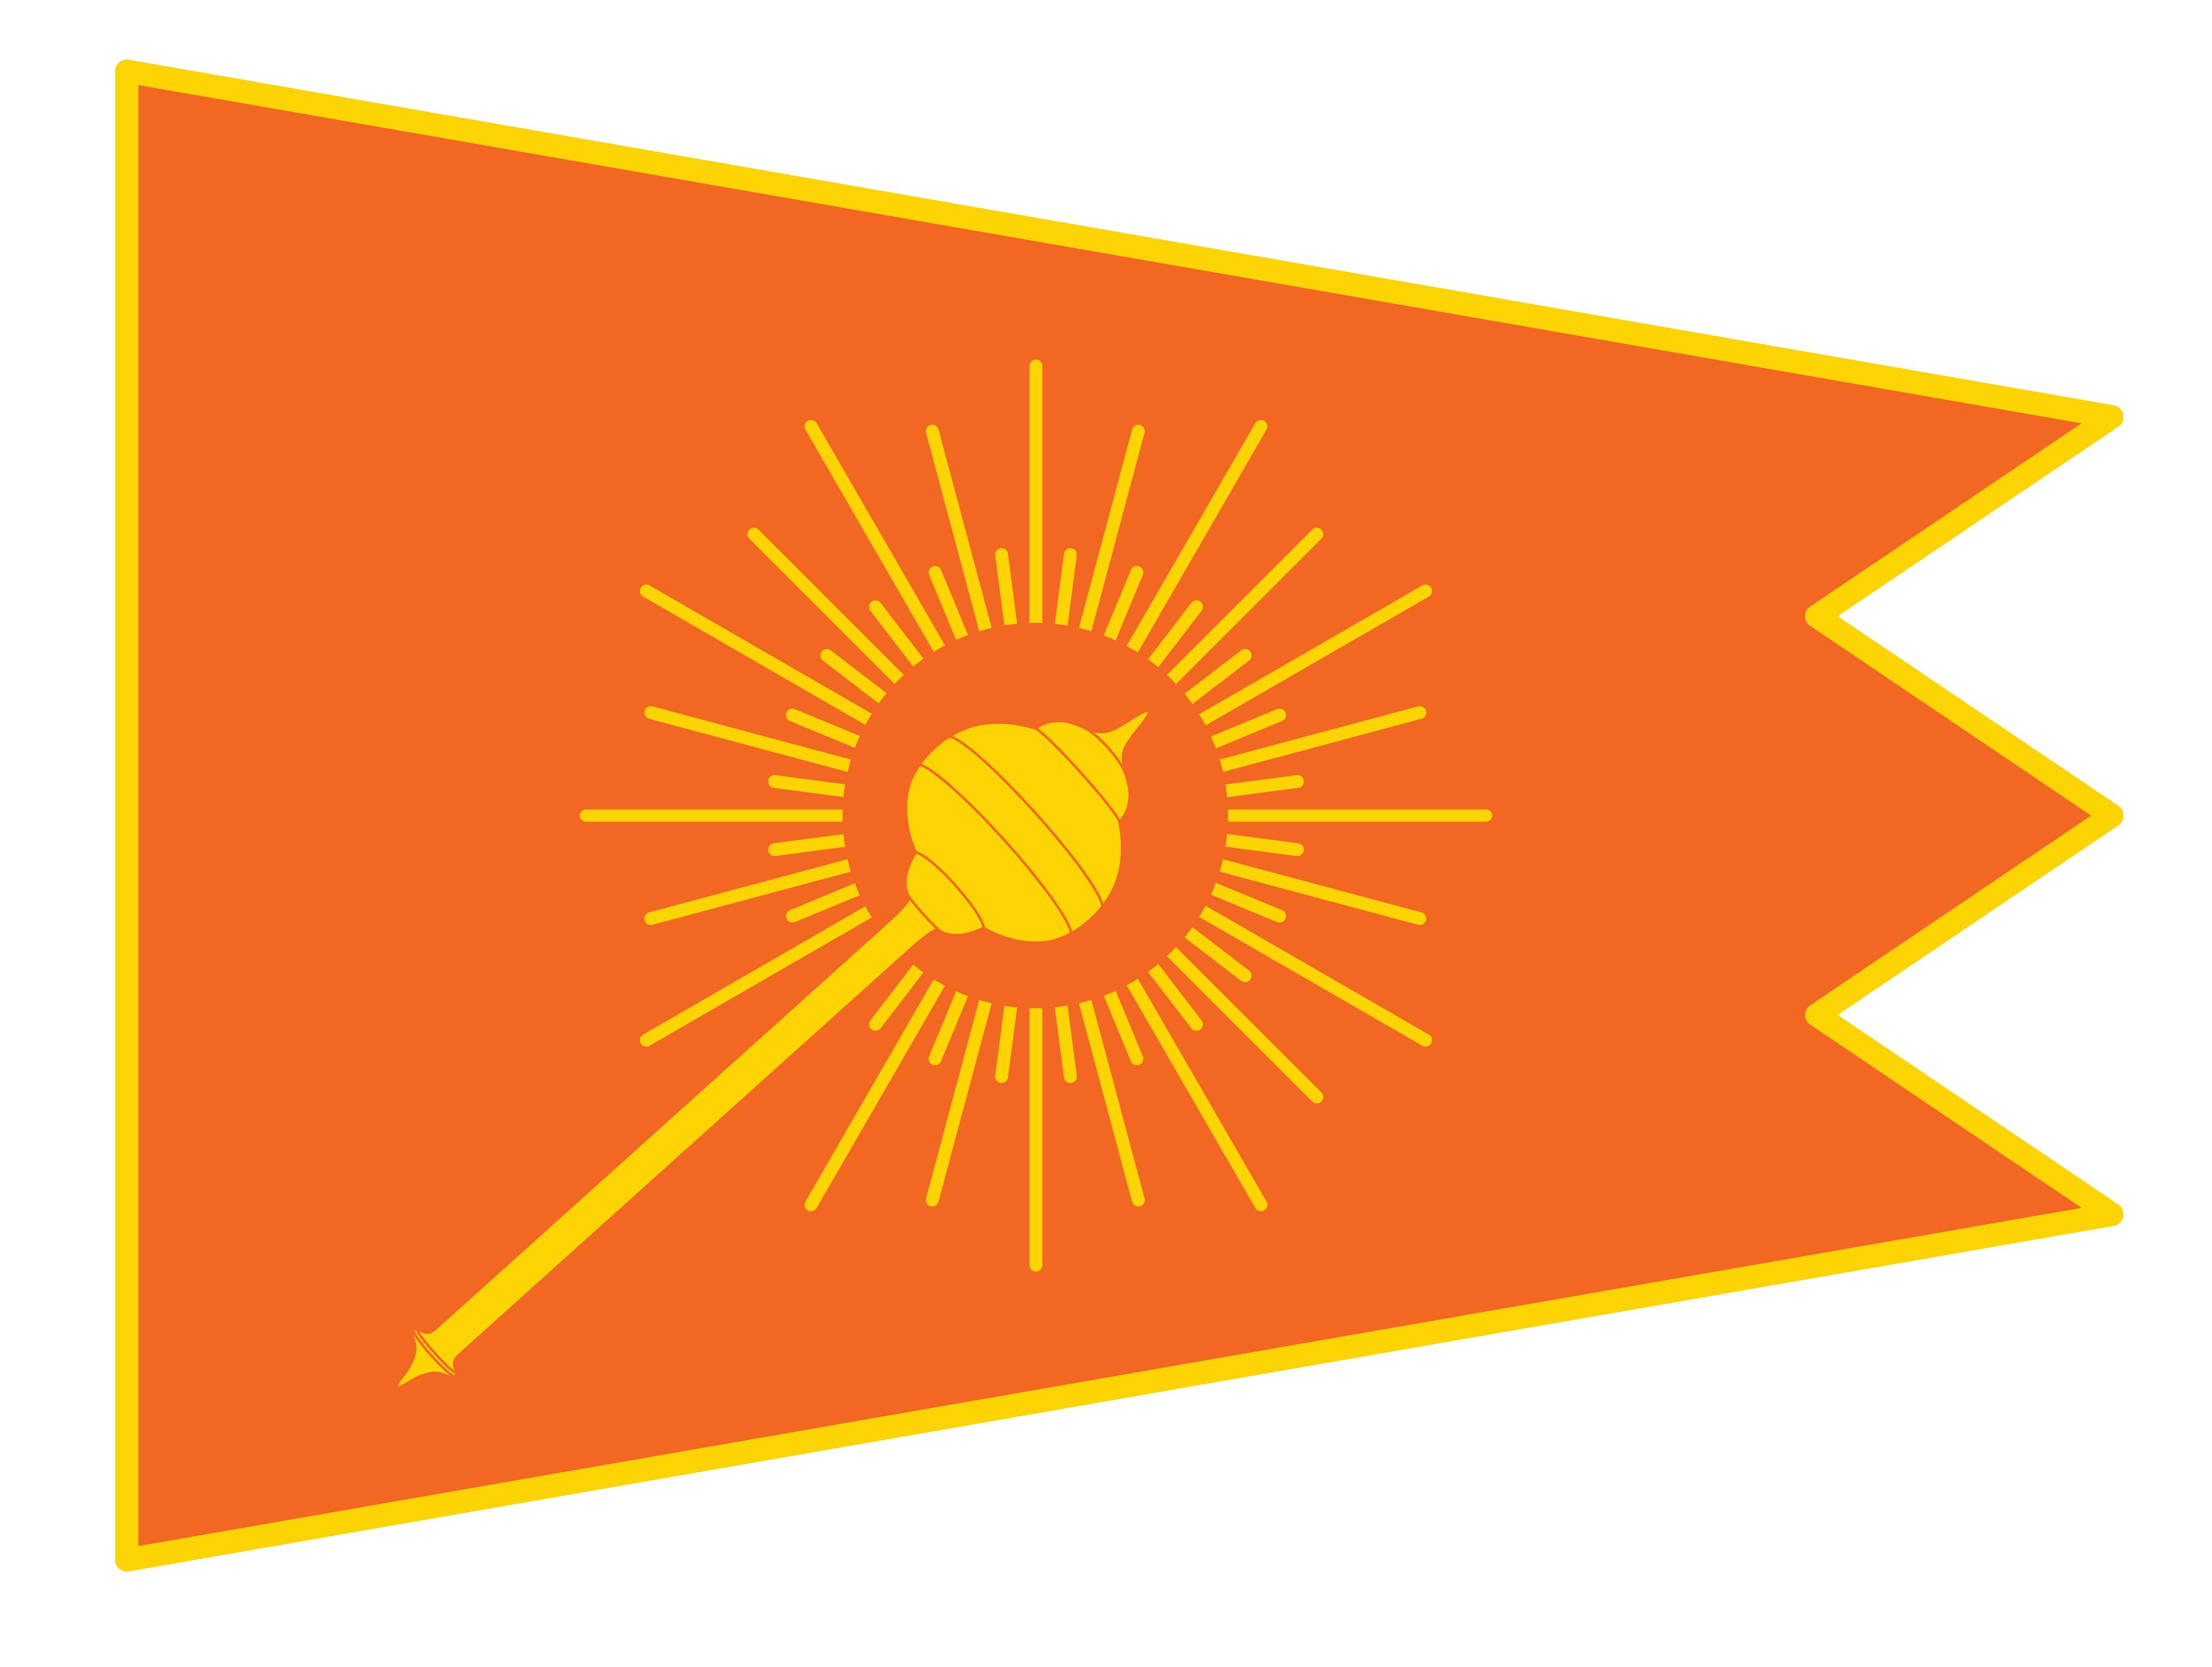 df-flag